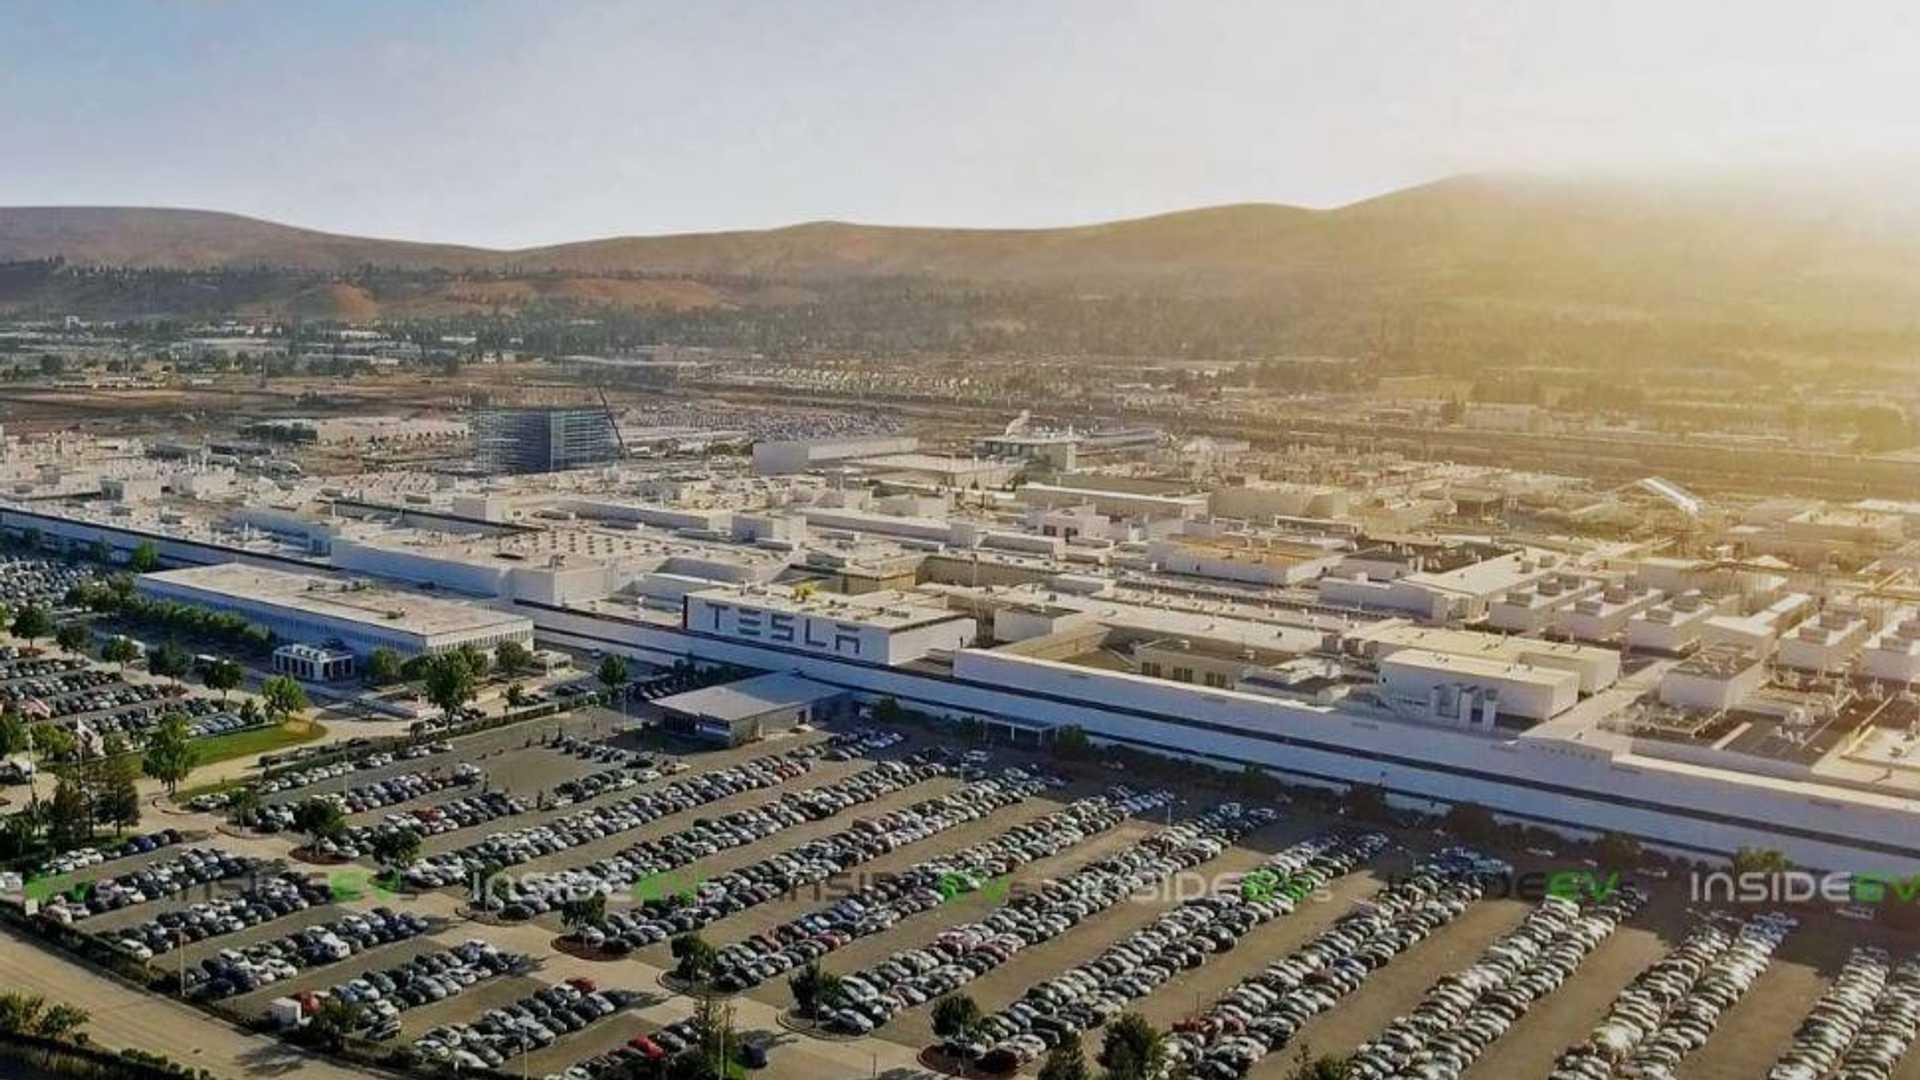 Let's Talk About The Tesla Short-Seller Drama